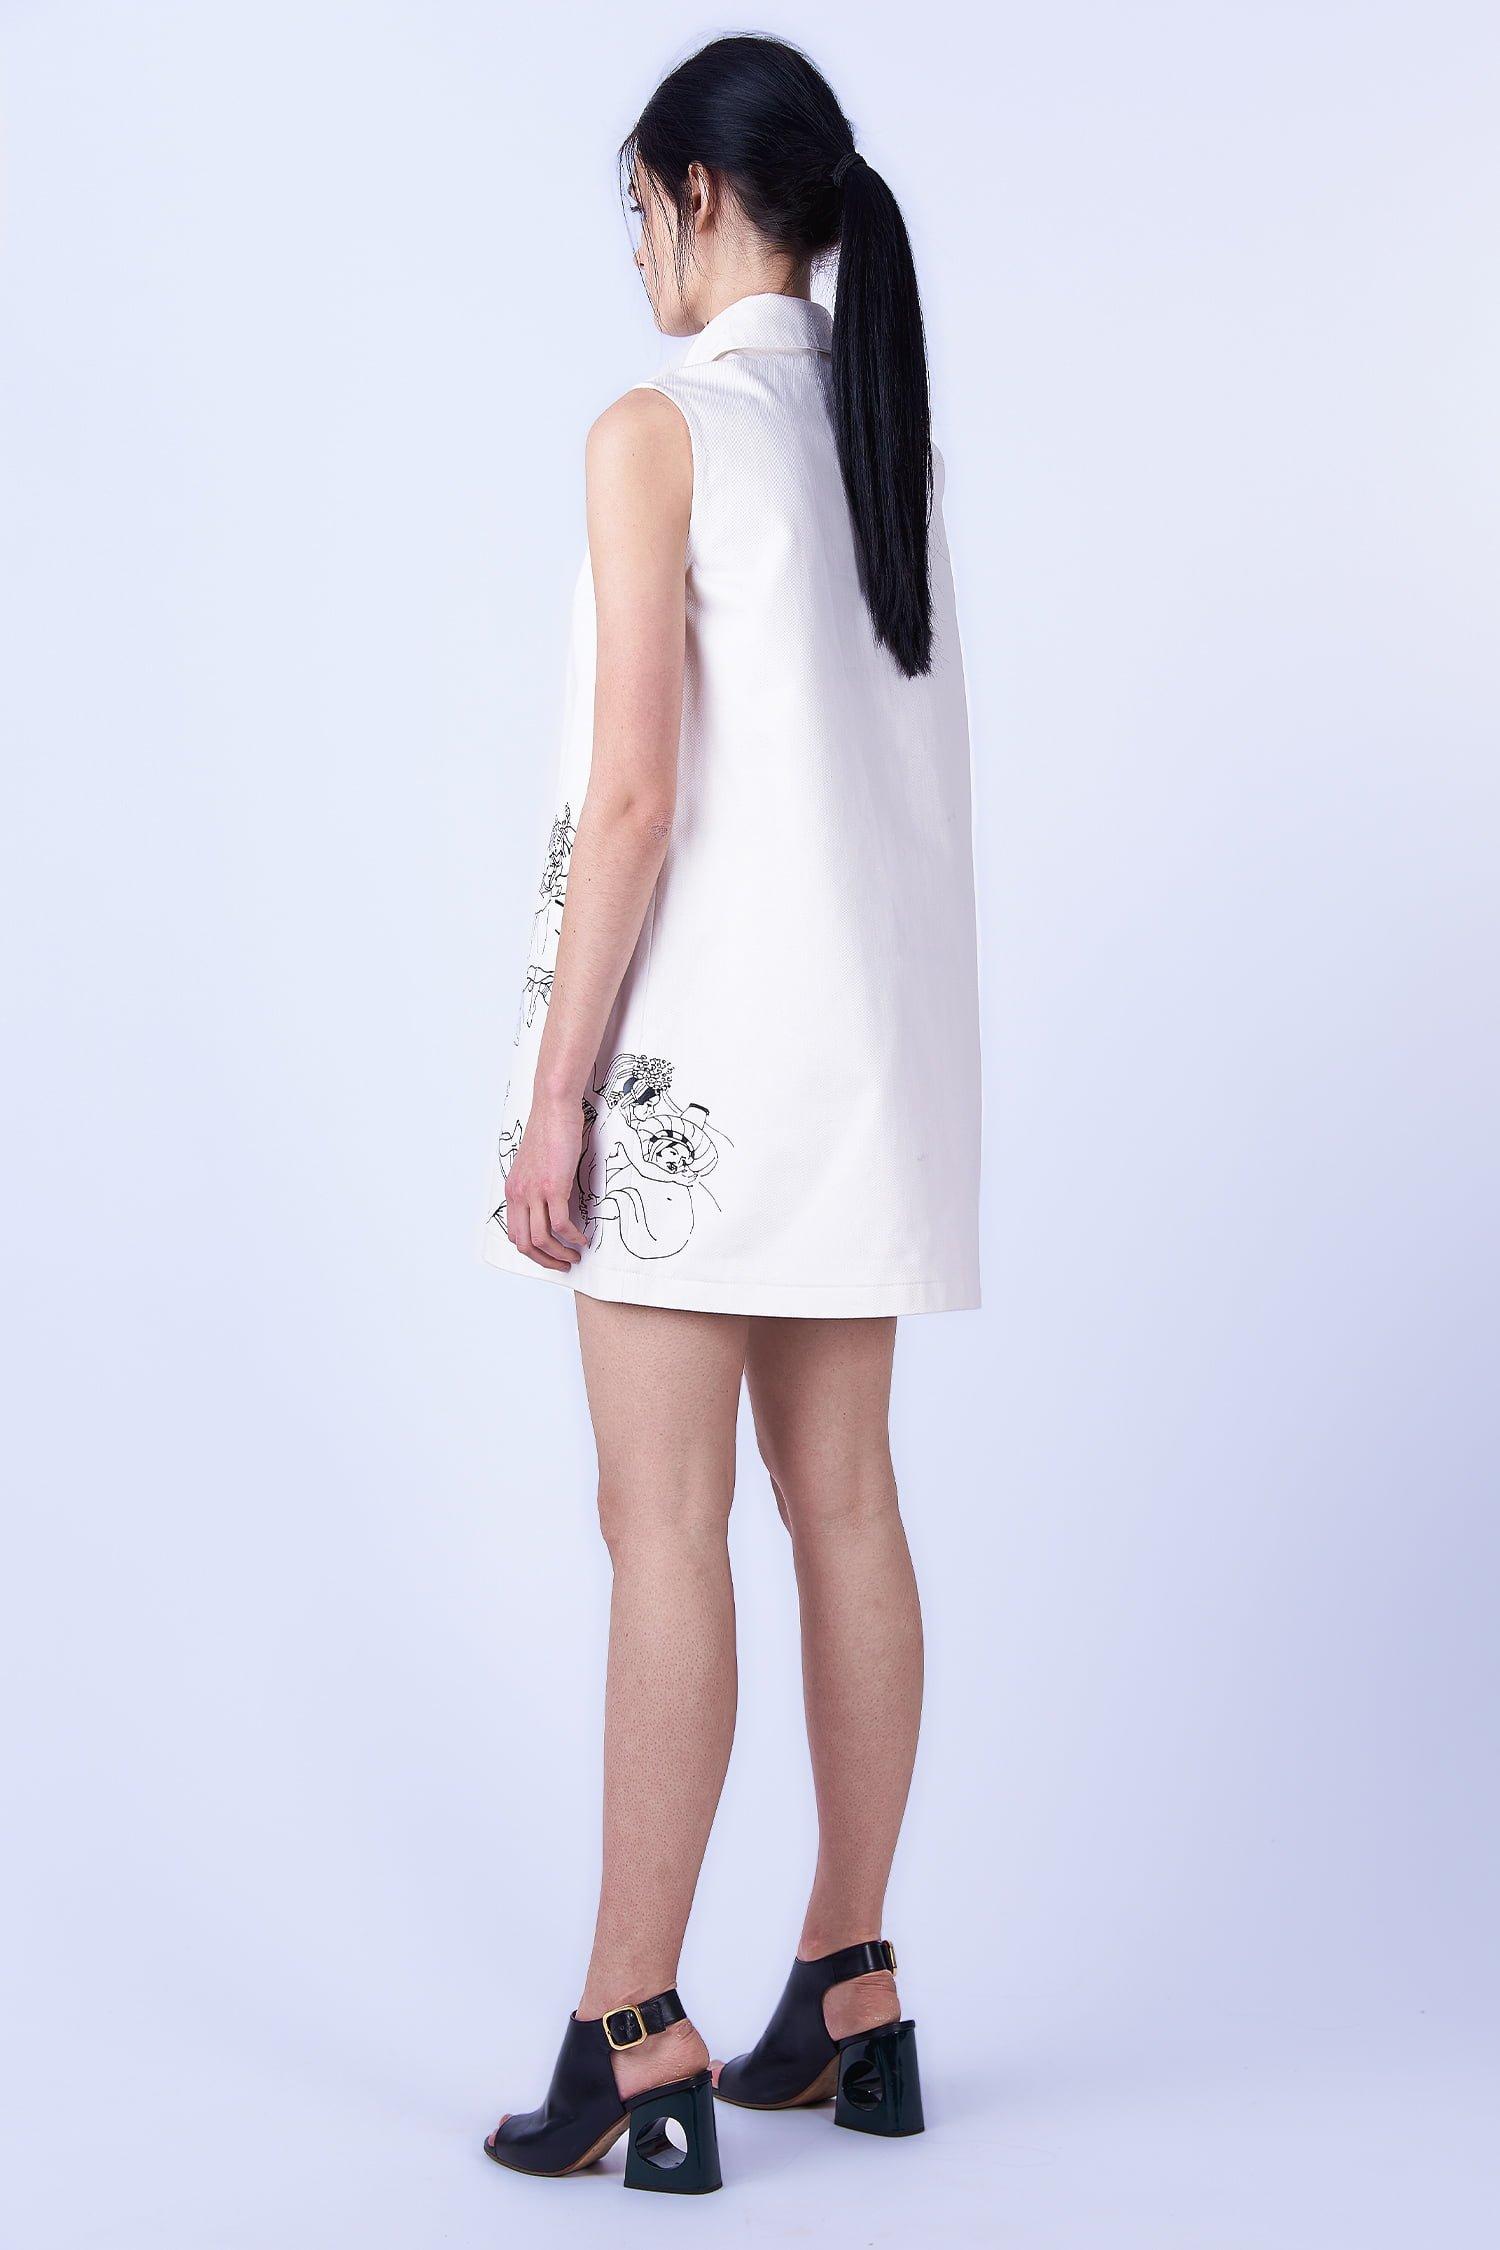 Acephala SS2019 Slavic Goddesses - White Print Mini Dress Sukienka Biała Print side back